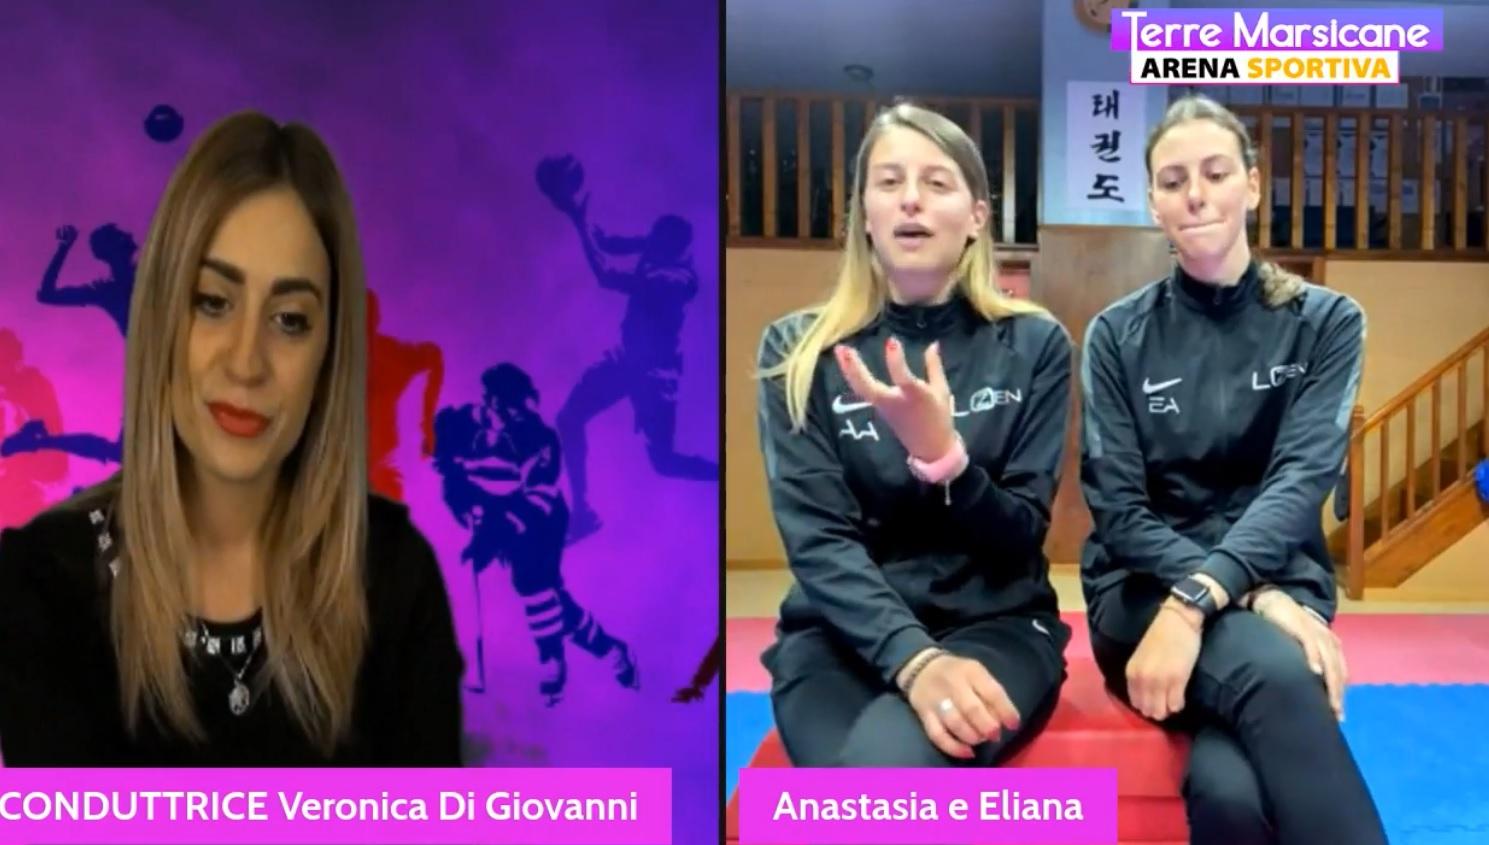 Taekwondo, Anastasia diventa allenatrice di taekwondo e istruttrice di ginnastica funzionale